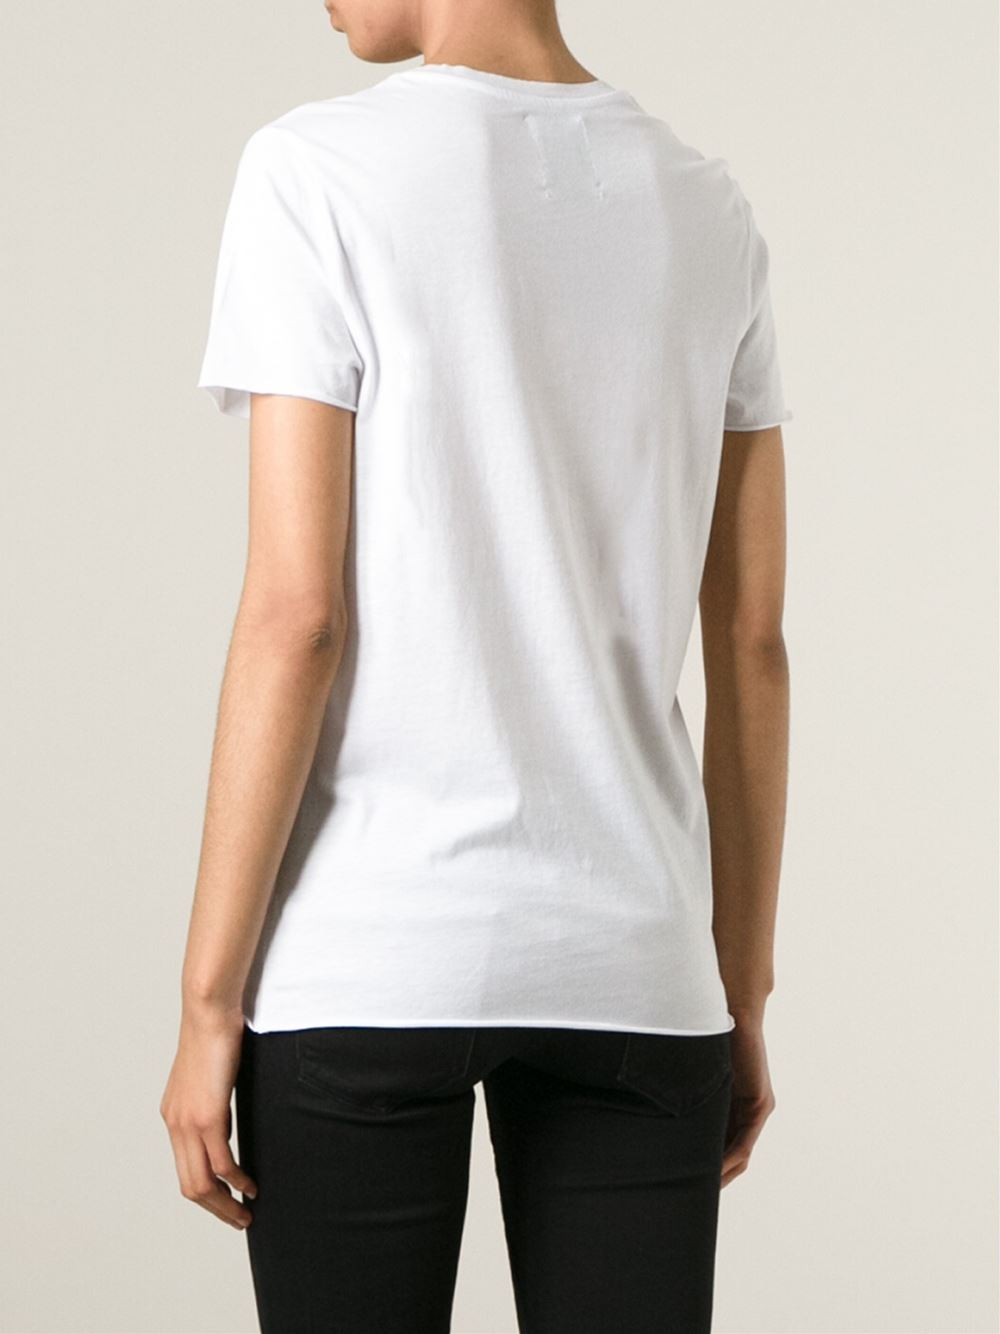 Zoe Karssen Flamingo Print T Shirt In White Lyst